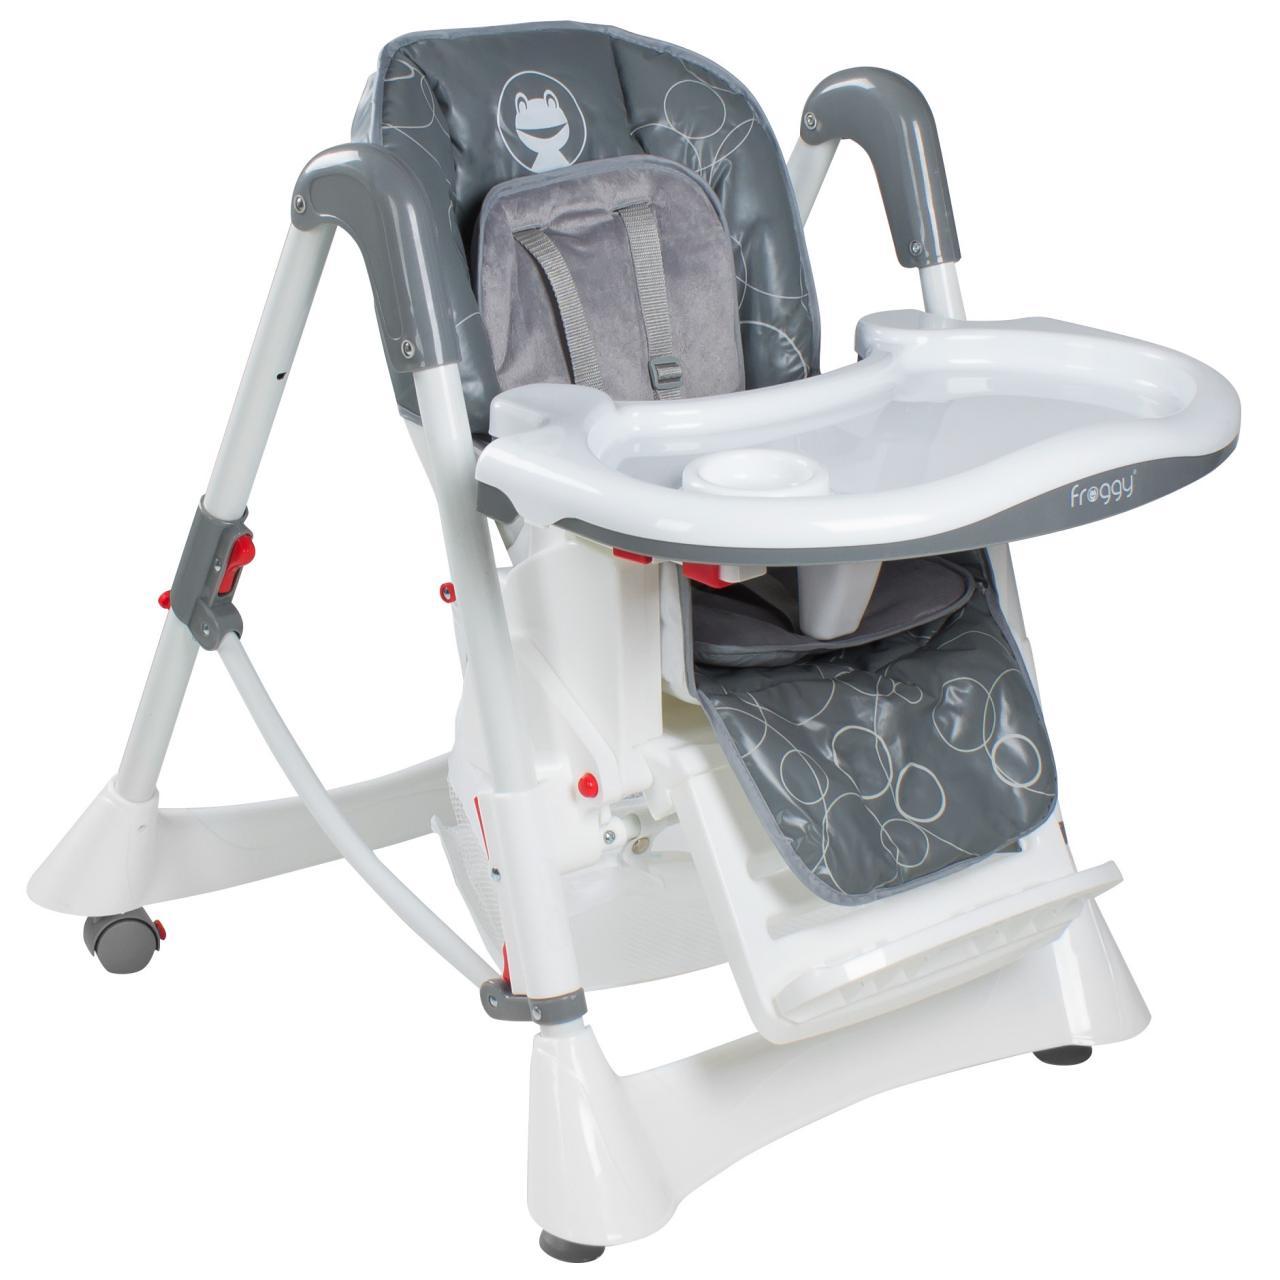 froggy babystuhl kinderstuhl hochstuhl verstellbar klappbar 3 sitzpositionen ebay. Black Bedroom Furniture Sets. Home Design Ideas